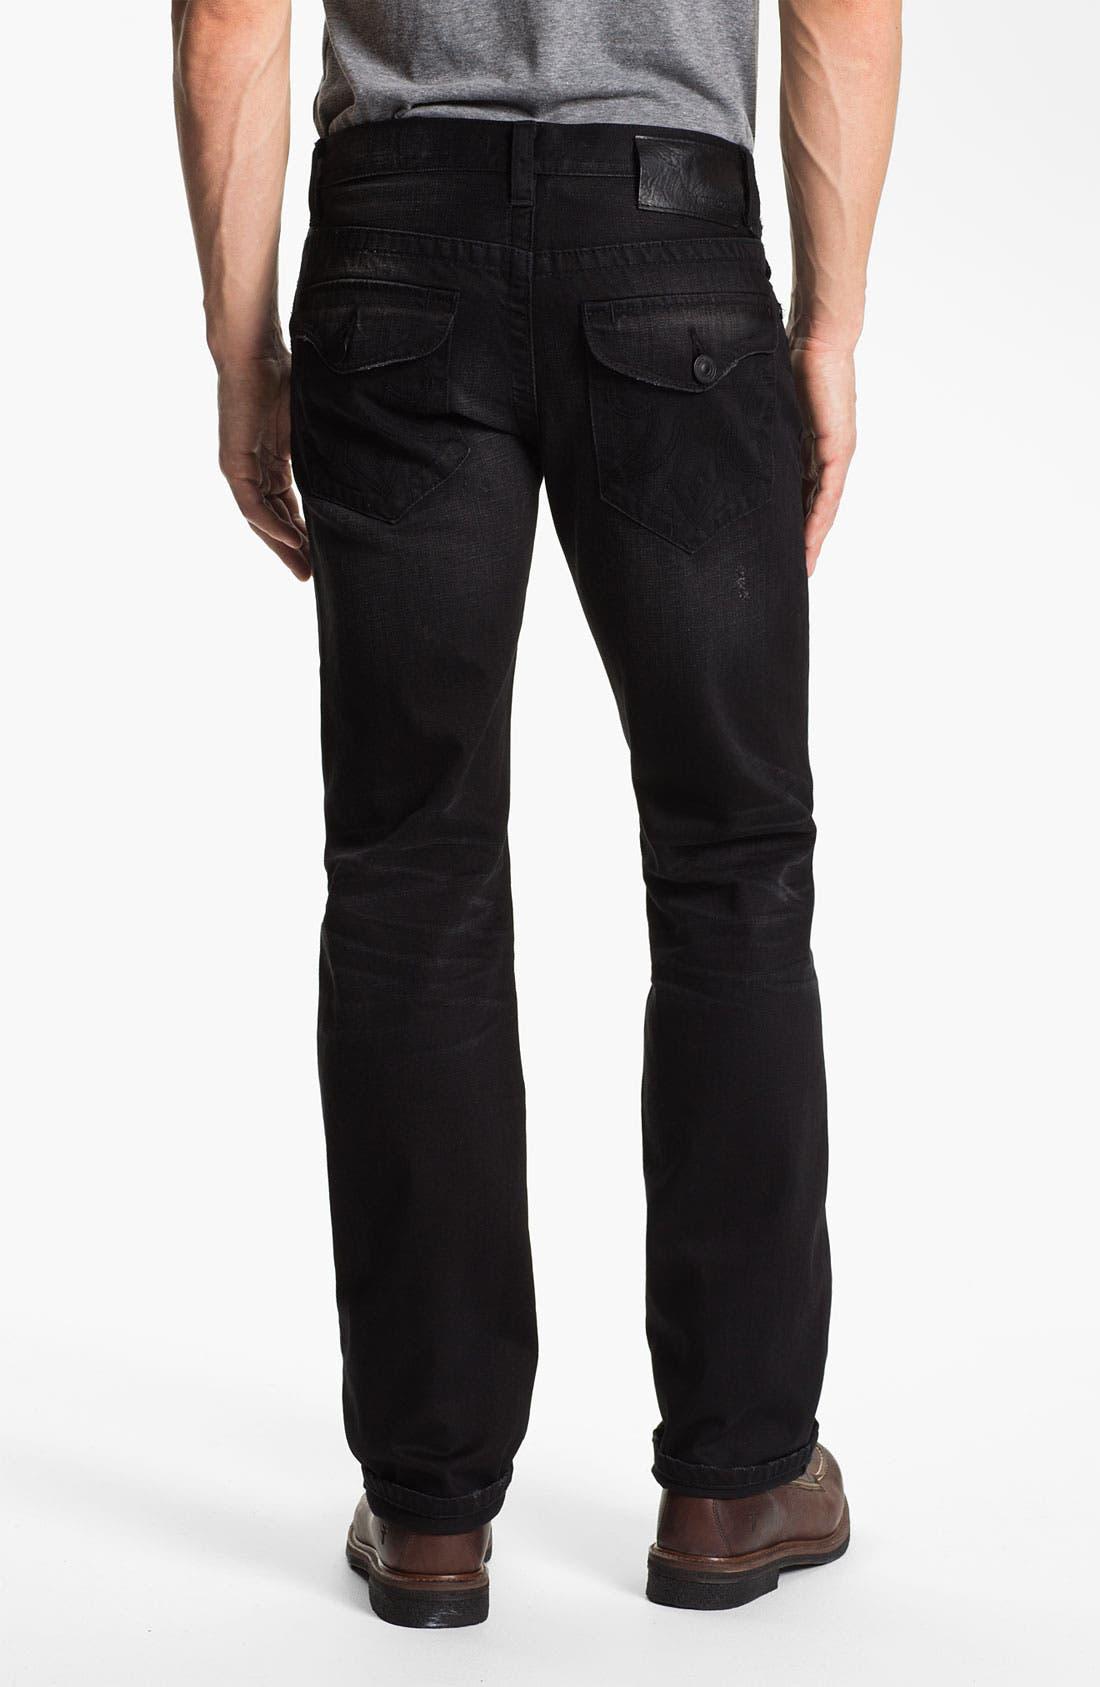 Main Image - MEK Denim 'Riley' Straight Leg Jeans (Miner Black)